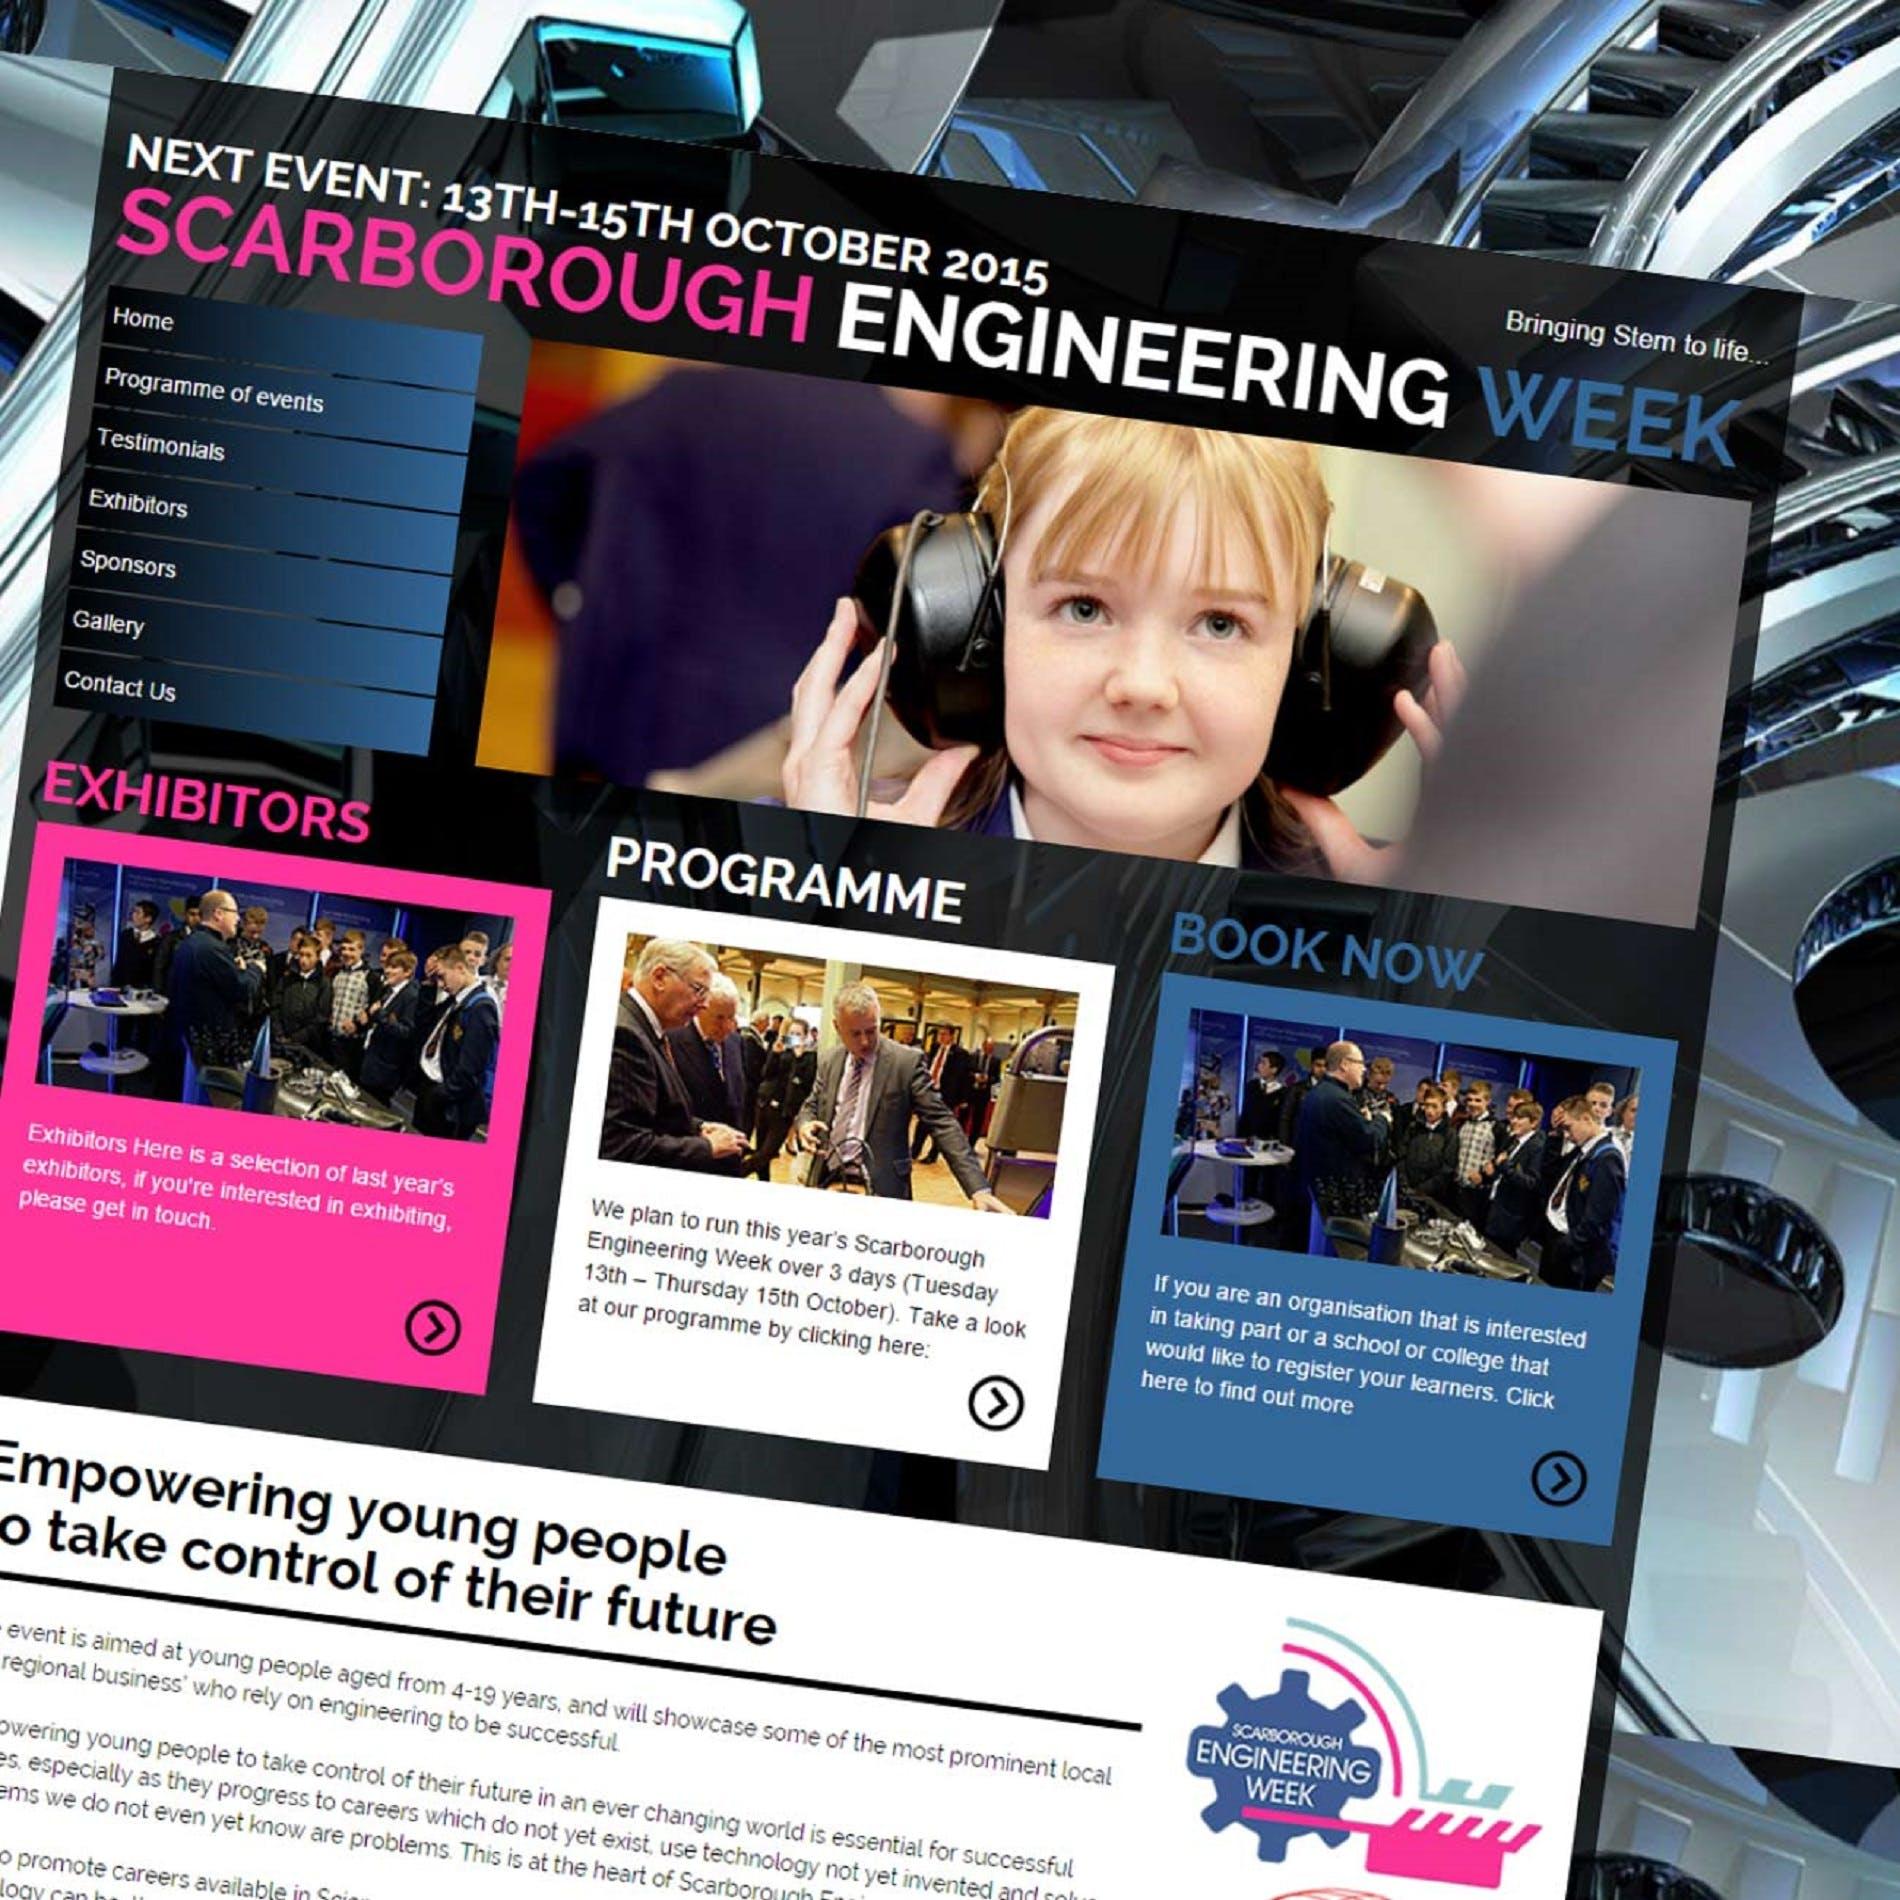 Free stock photo of Scarborough Engineering Week